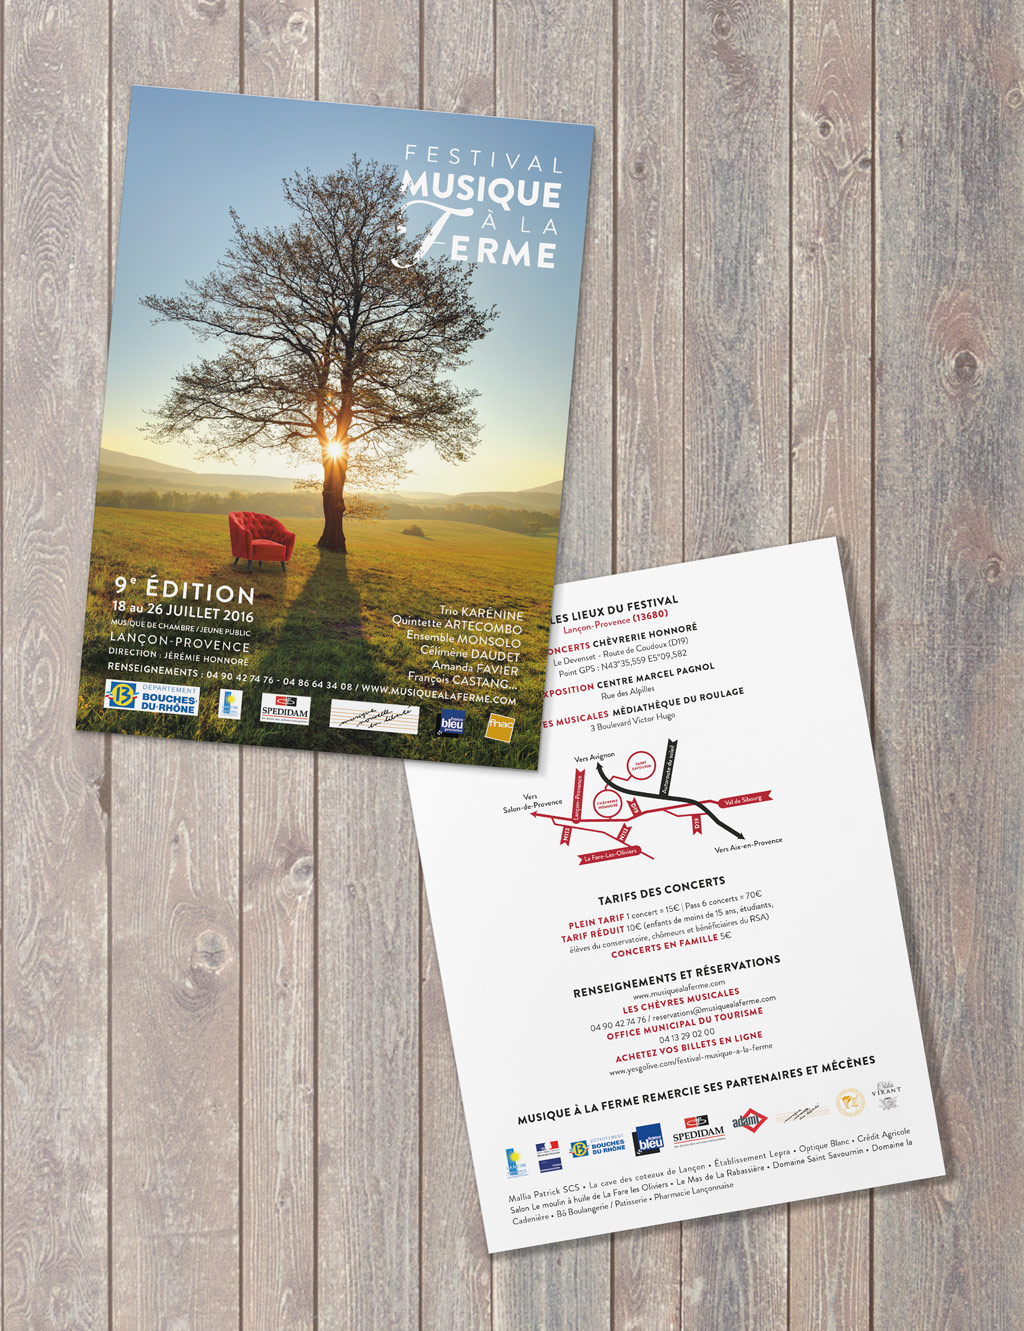 Flyer for the Classical music Festival Musique à la Ferme during the 2016 summer in Provence © Calliopé Studio, Marine Pavé 2016